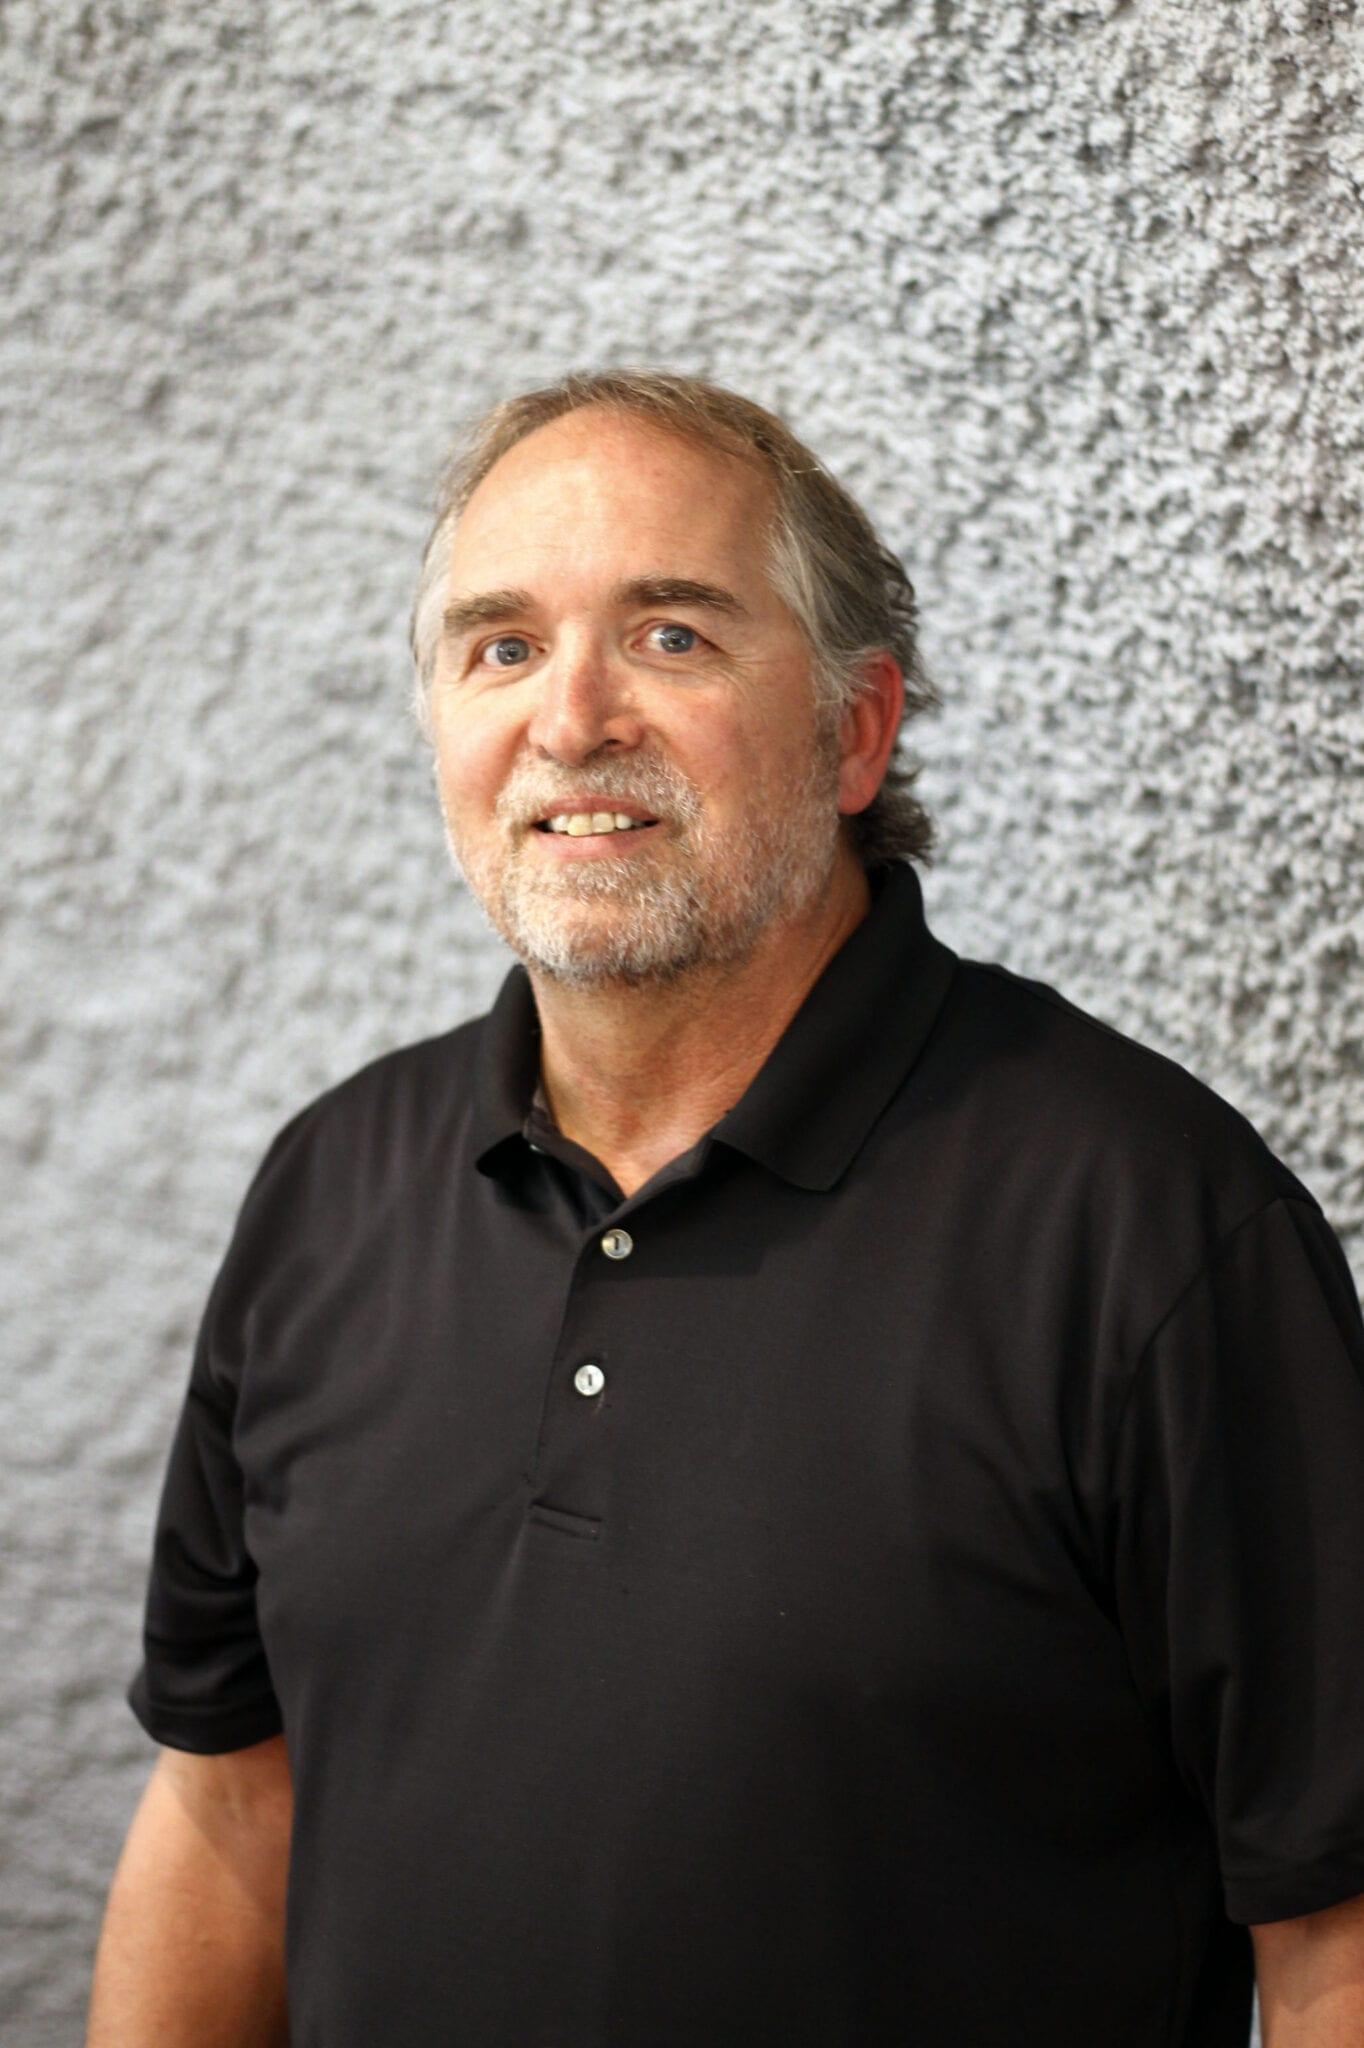 Ron Lauber